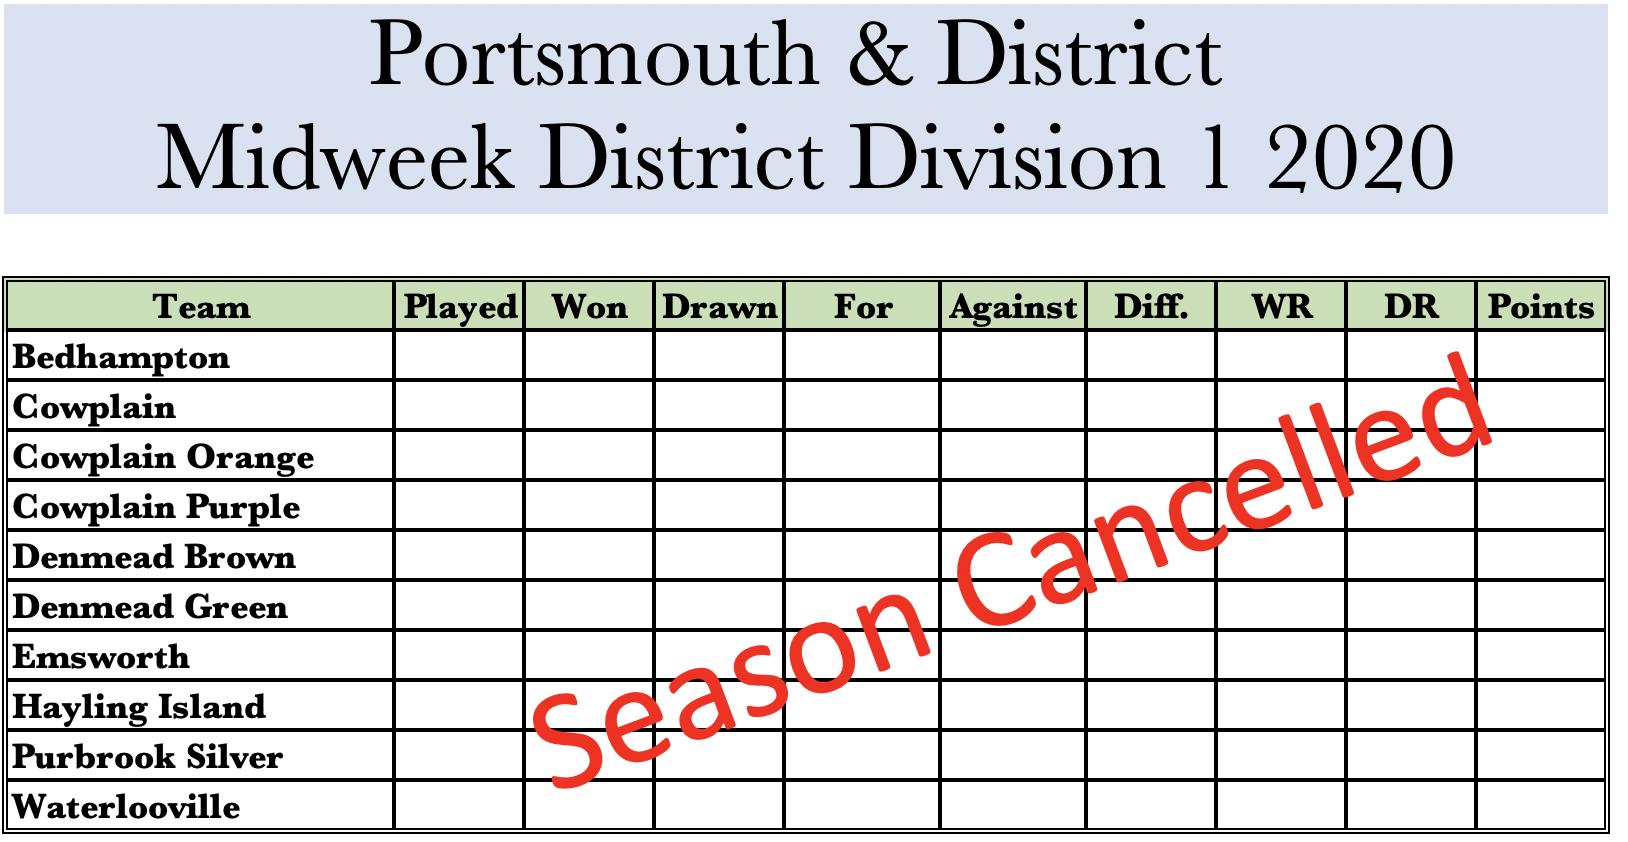 Midweek District Table 2020